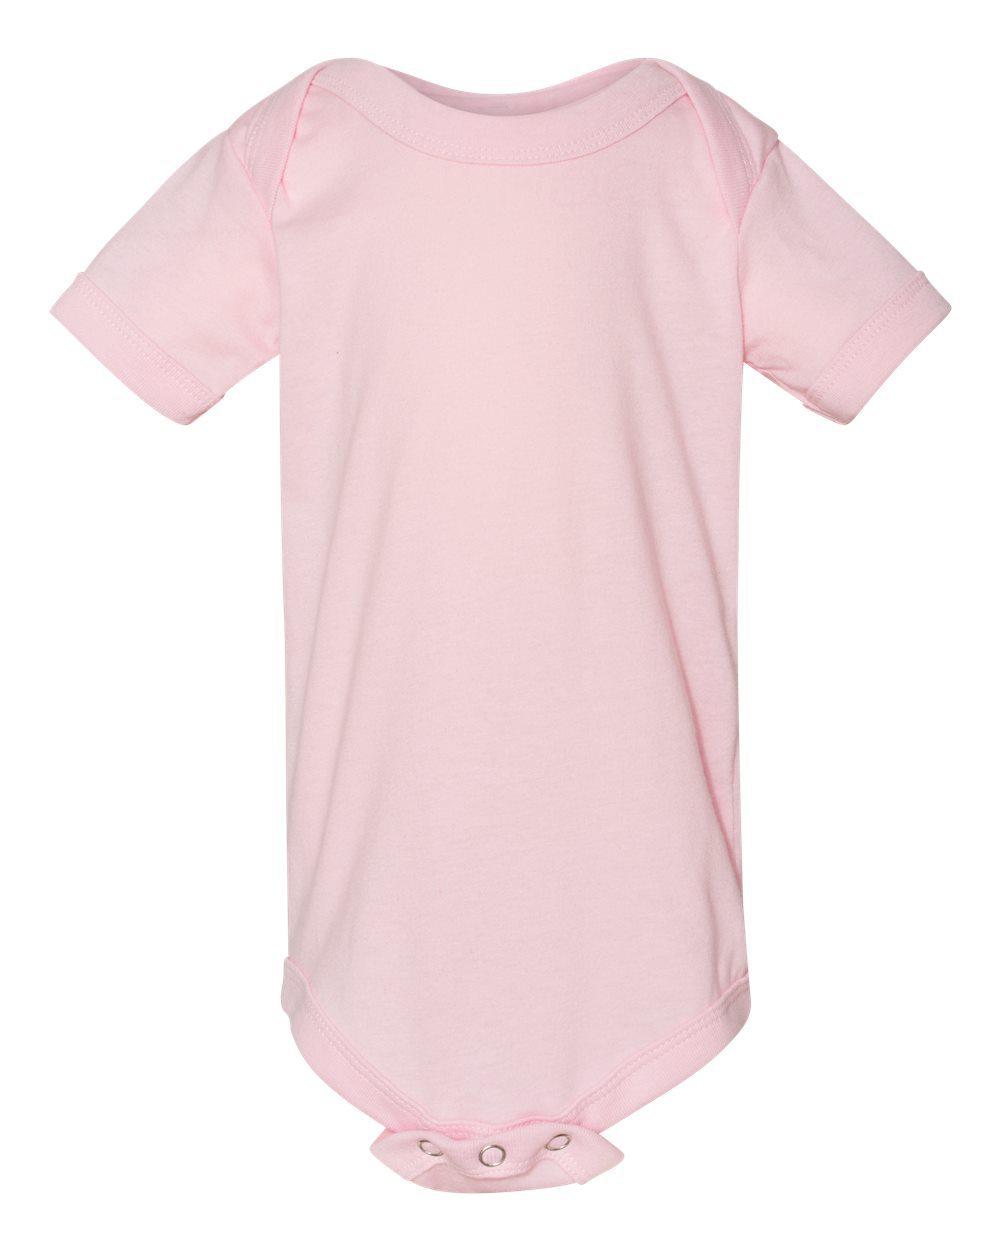 9e7644c41 Bella + Canvas Baby Short Sleeve Onesie 100B [from $8.03] | Hosiery ...